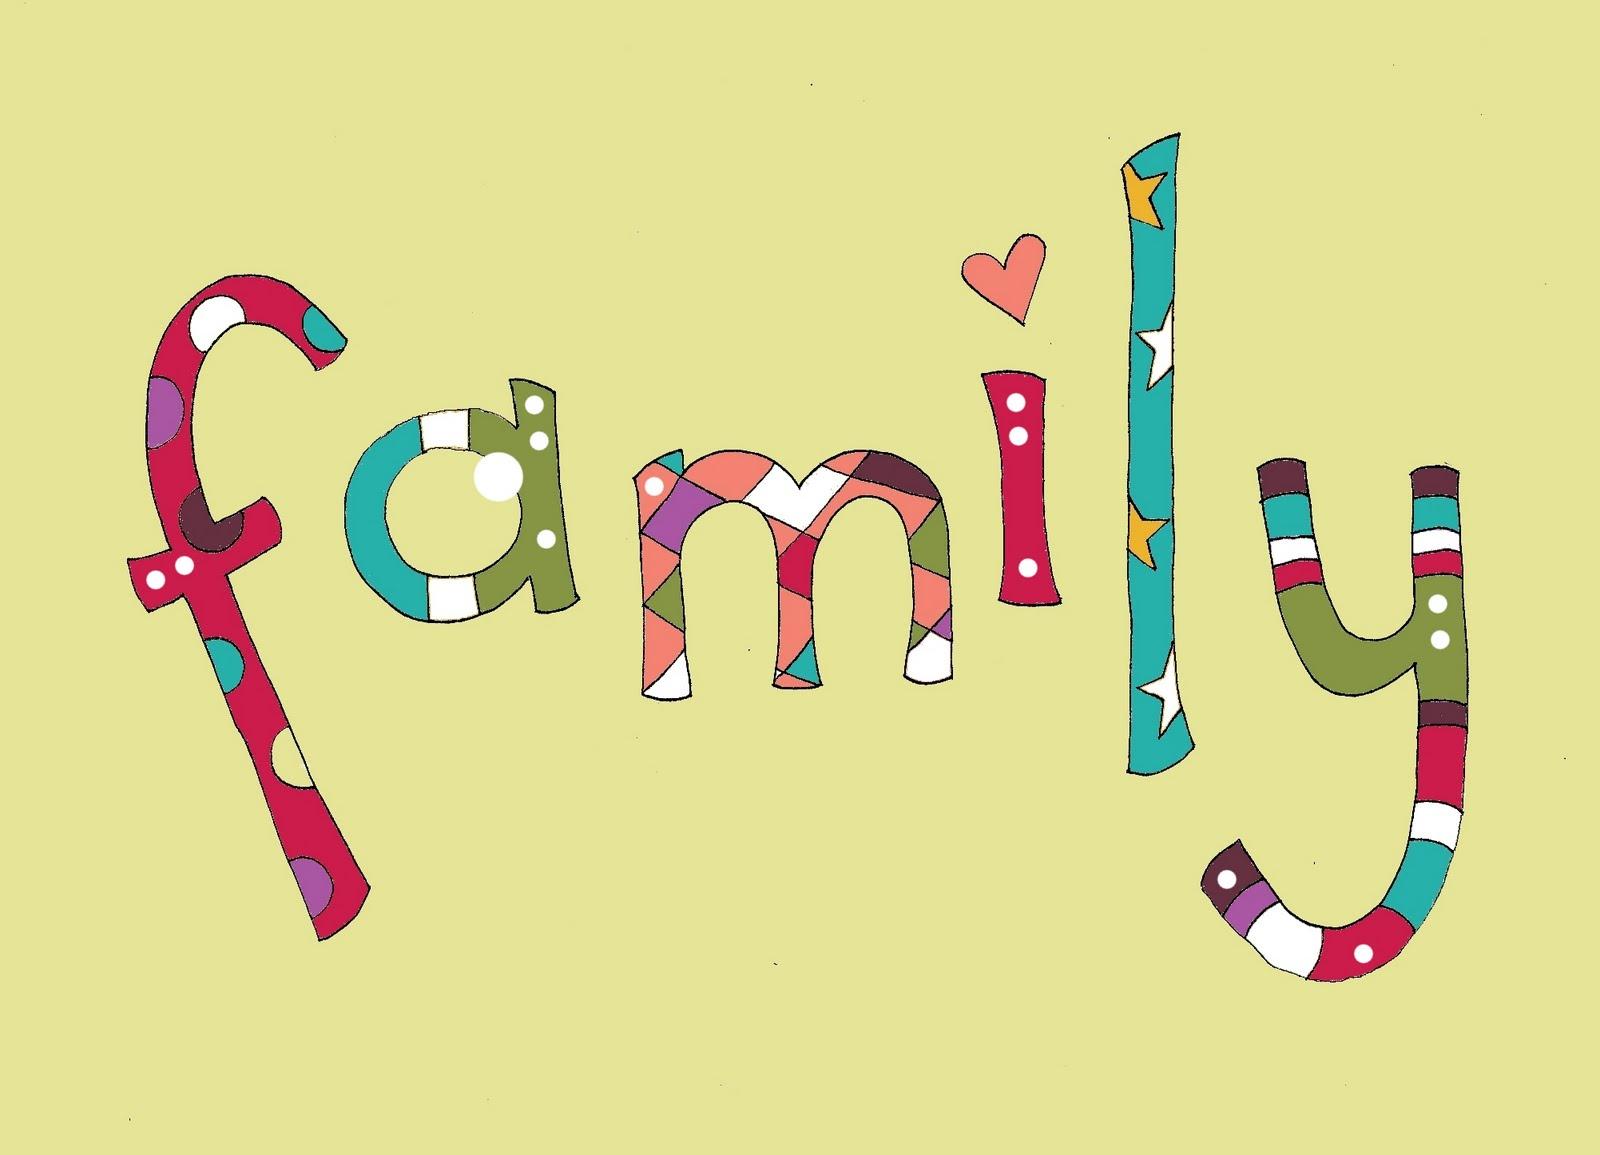 20 Frasi Sulla Famiglia Frasi Aforismi E Citazioni